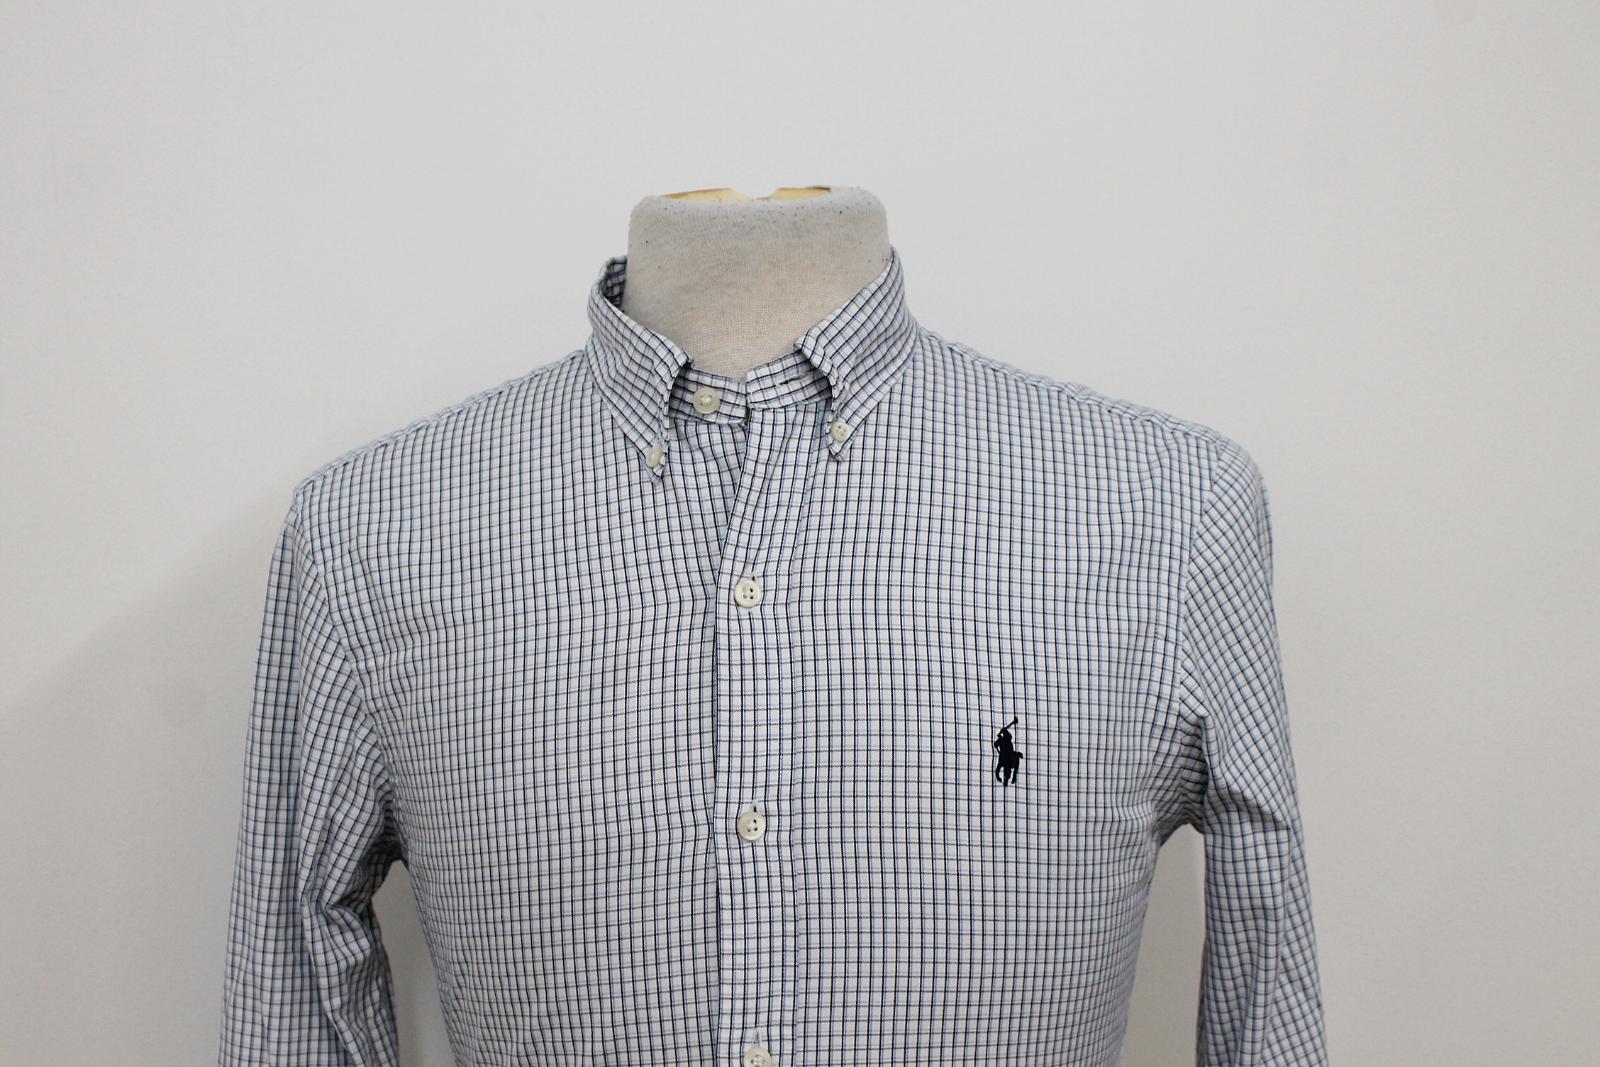 Polo-Ralph-Lauren-Para-Hombres-Blanco-Negro-Azul-Camisa-De-Patron-De-Cuadros-Slim-Fit-Talla-S miniatura 6